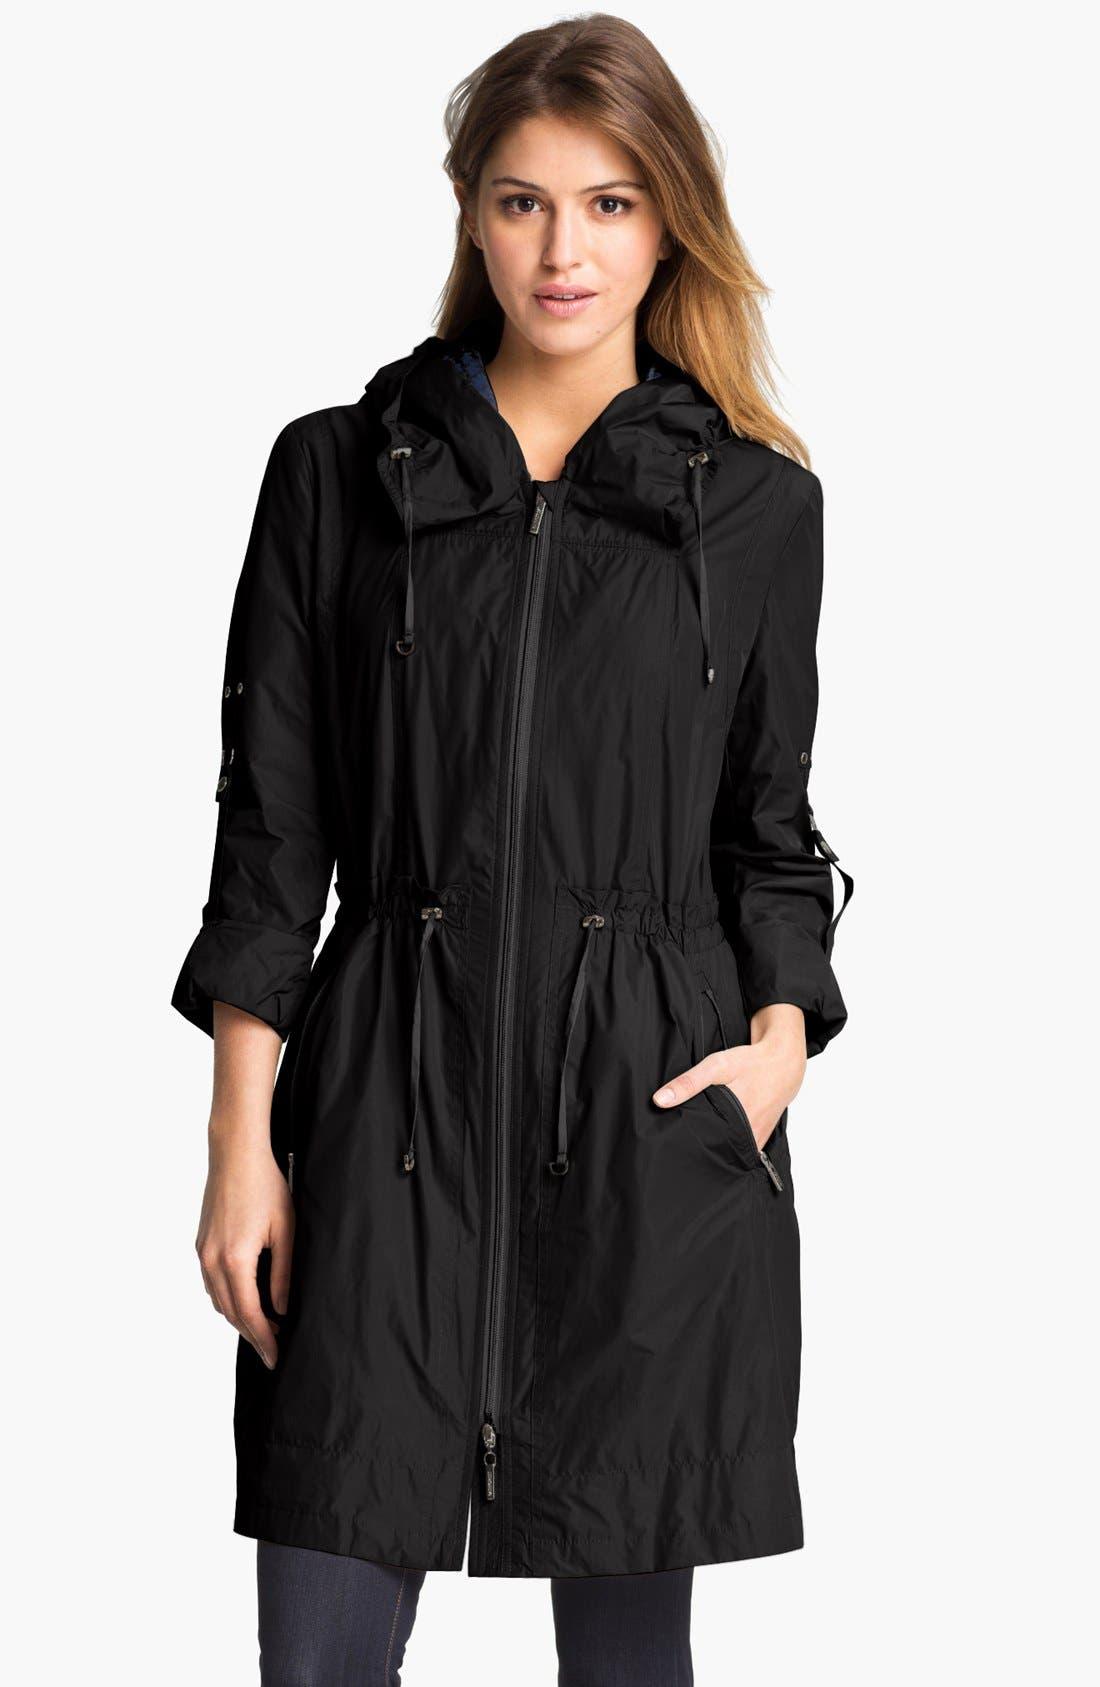 Alternate Image 1 Selected - RAINFOREST Packable Hooded Raincoat